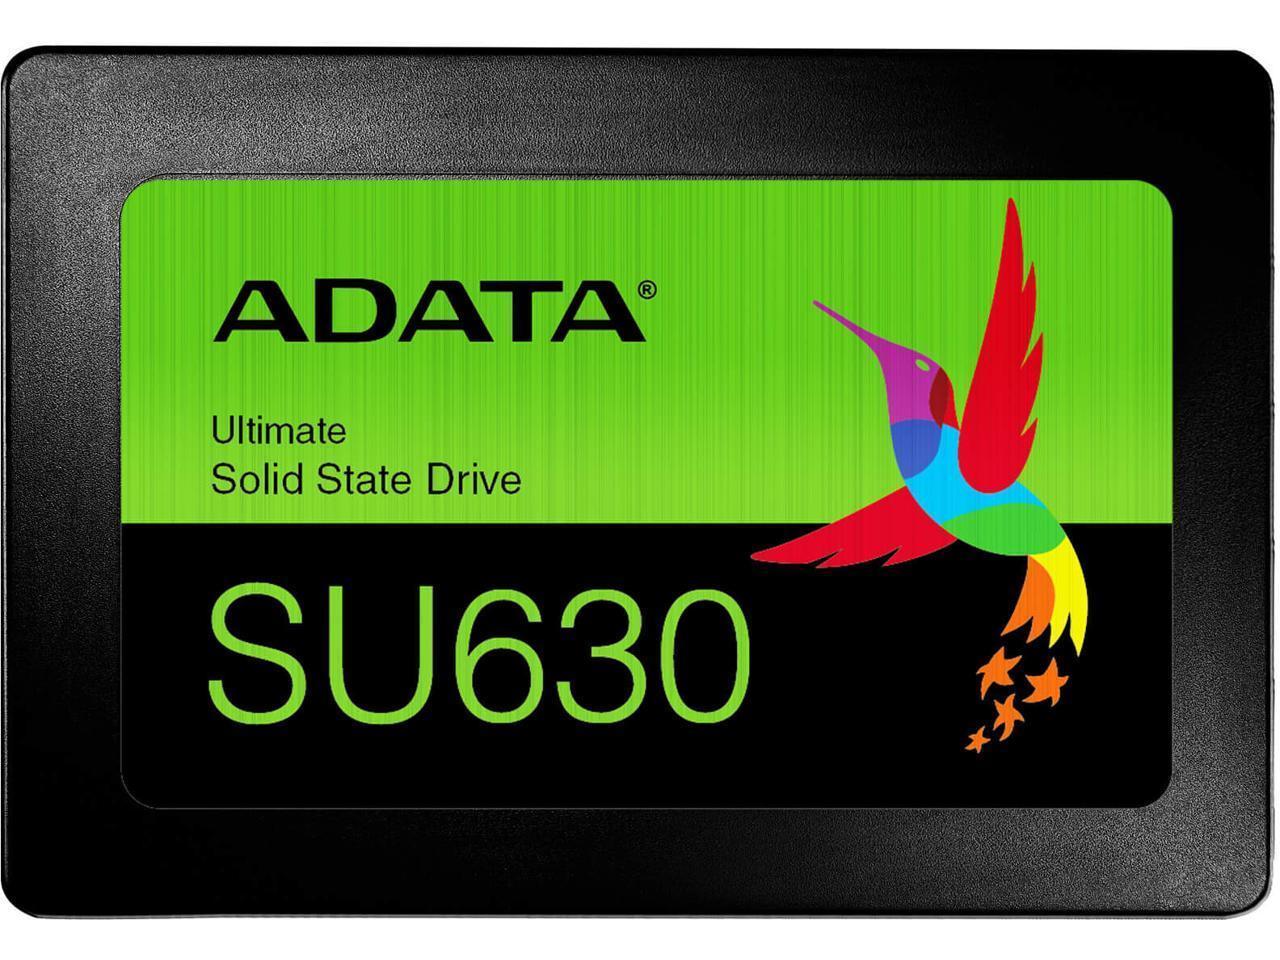 ADATA-Ultimate-Series-SU630-960GB-Internal-SATA-Solid-State-Drive